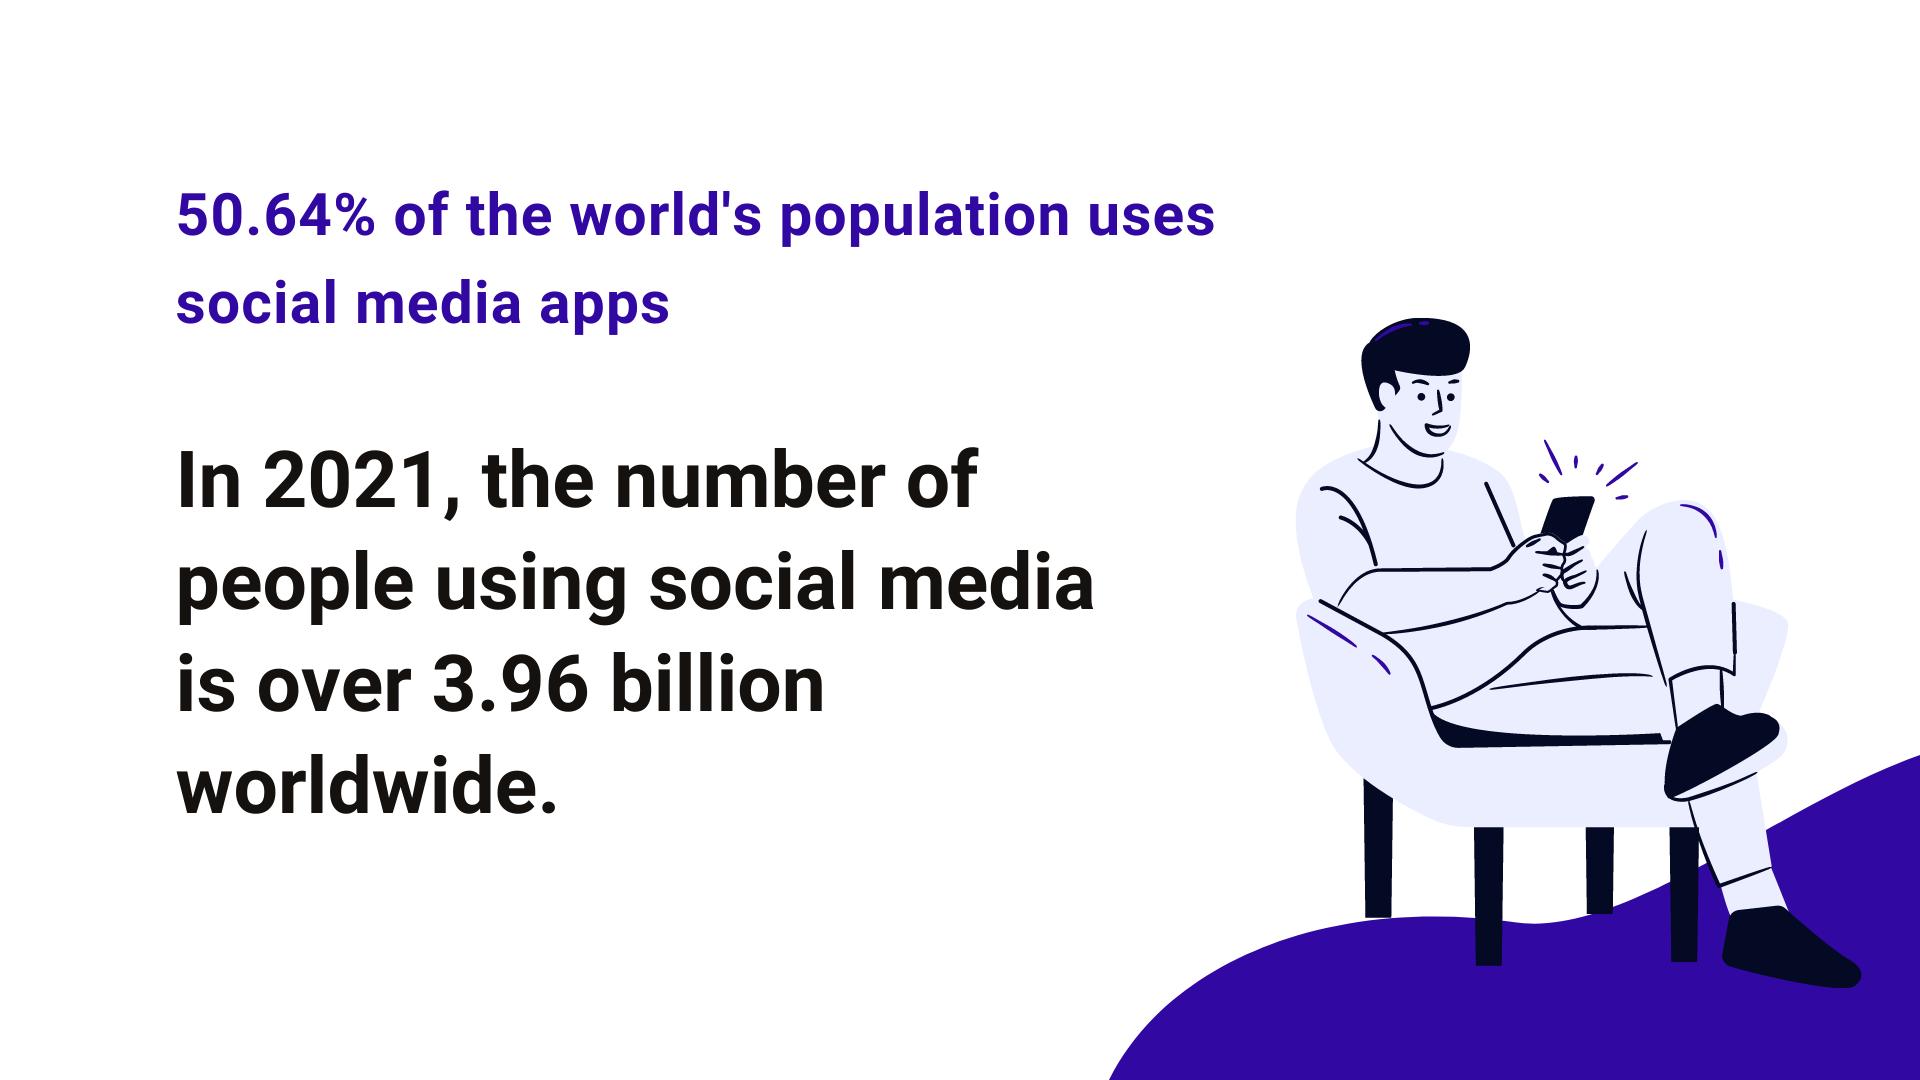 number of social media app users worldwide 2021